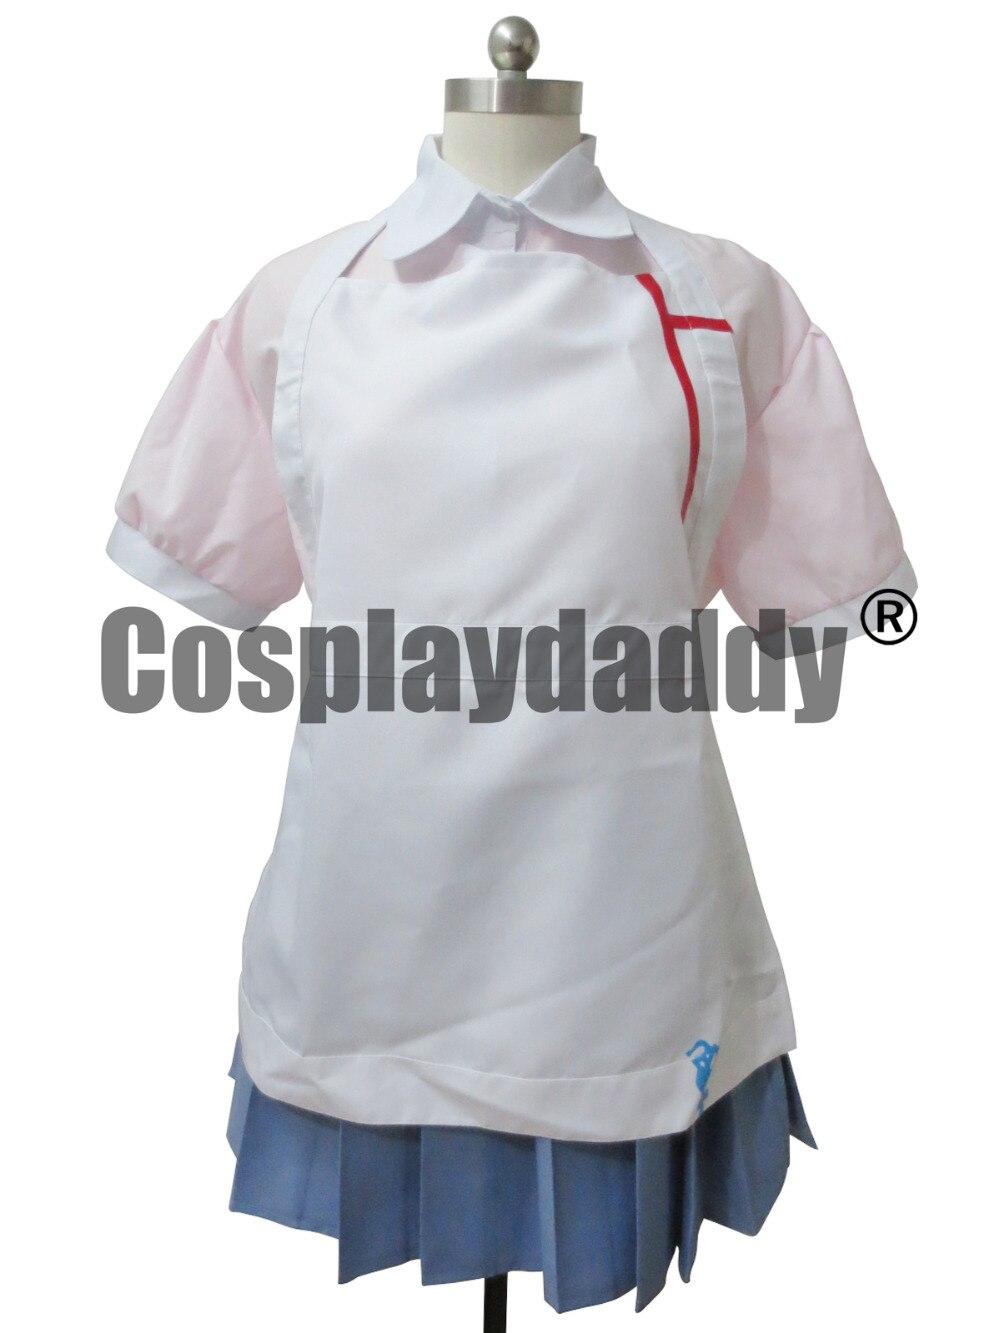 Super Dangan Ronpa 2 Danganronpa Mikan Tsumiki Cosplay Costume Outfit